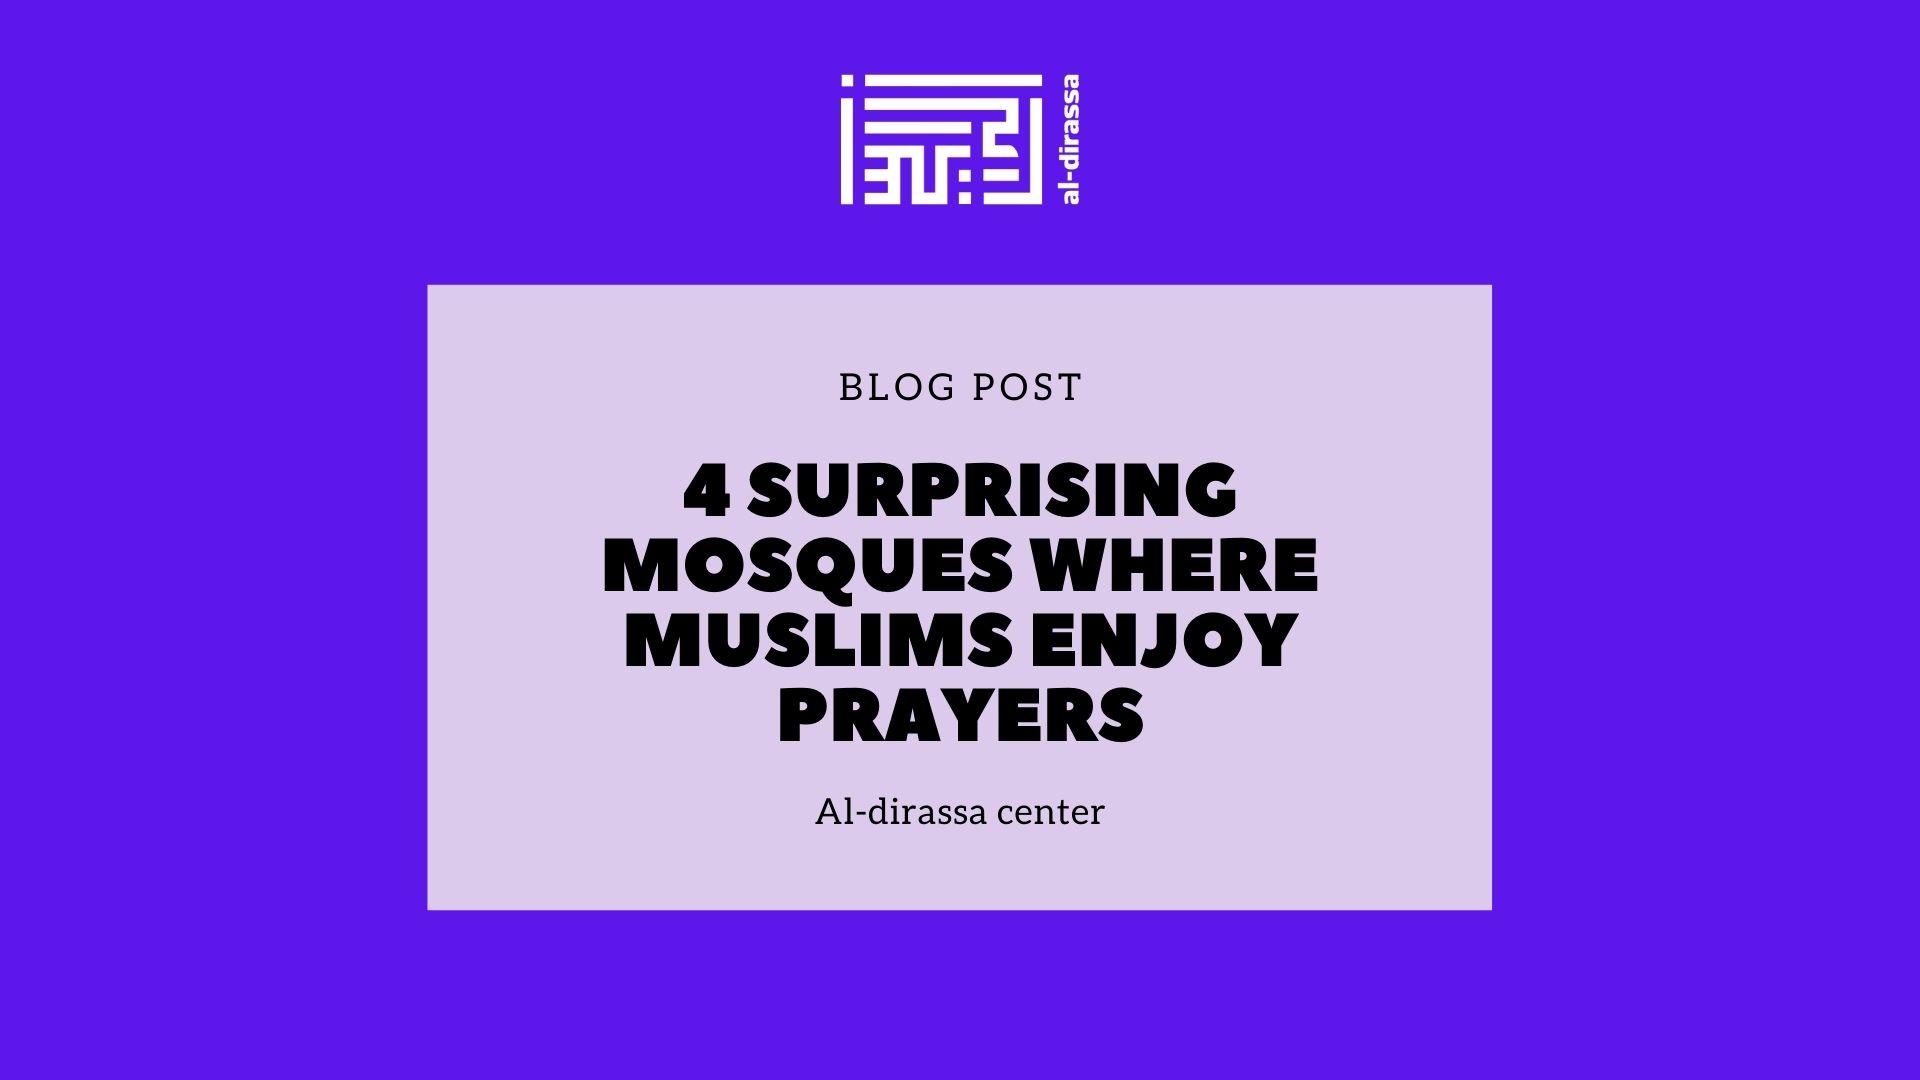 4 surprising mosques where Muslims enjoy prayers